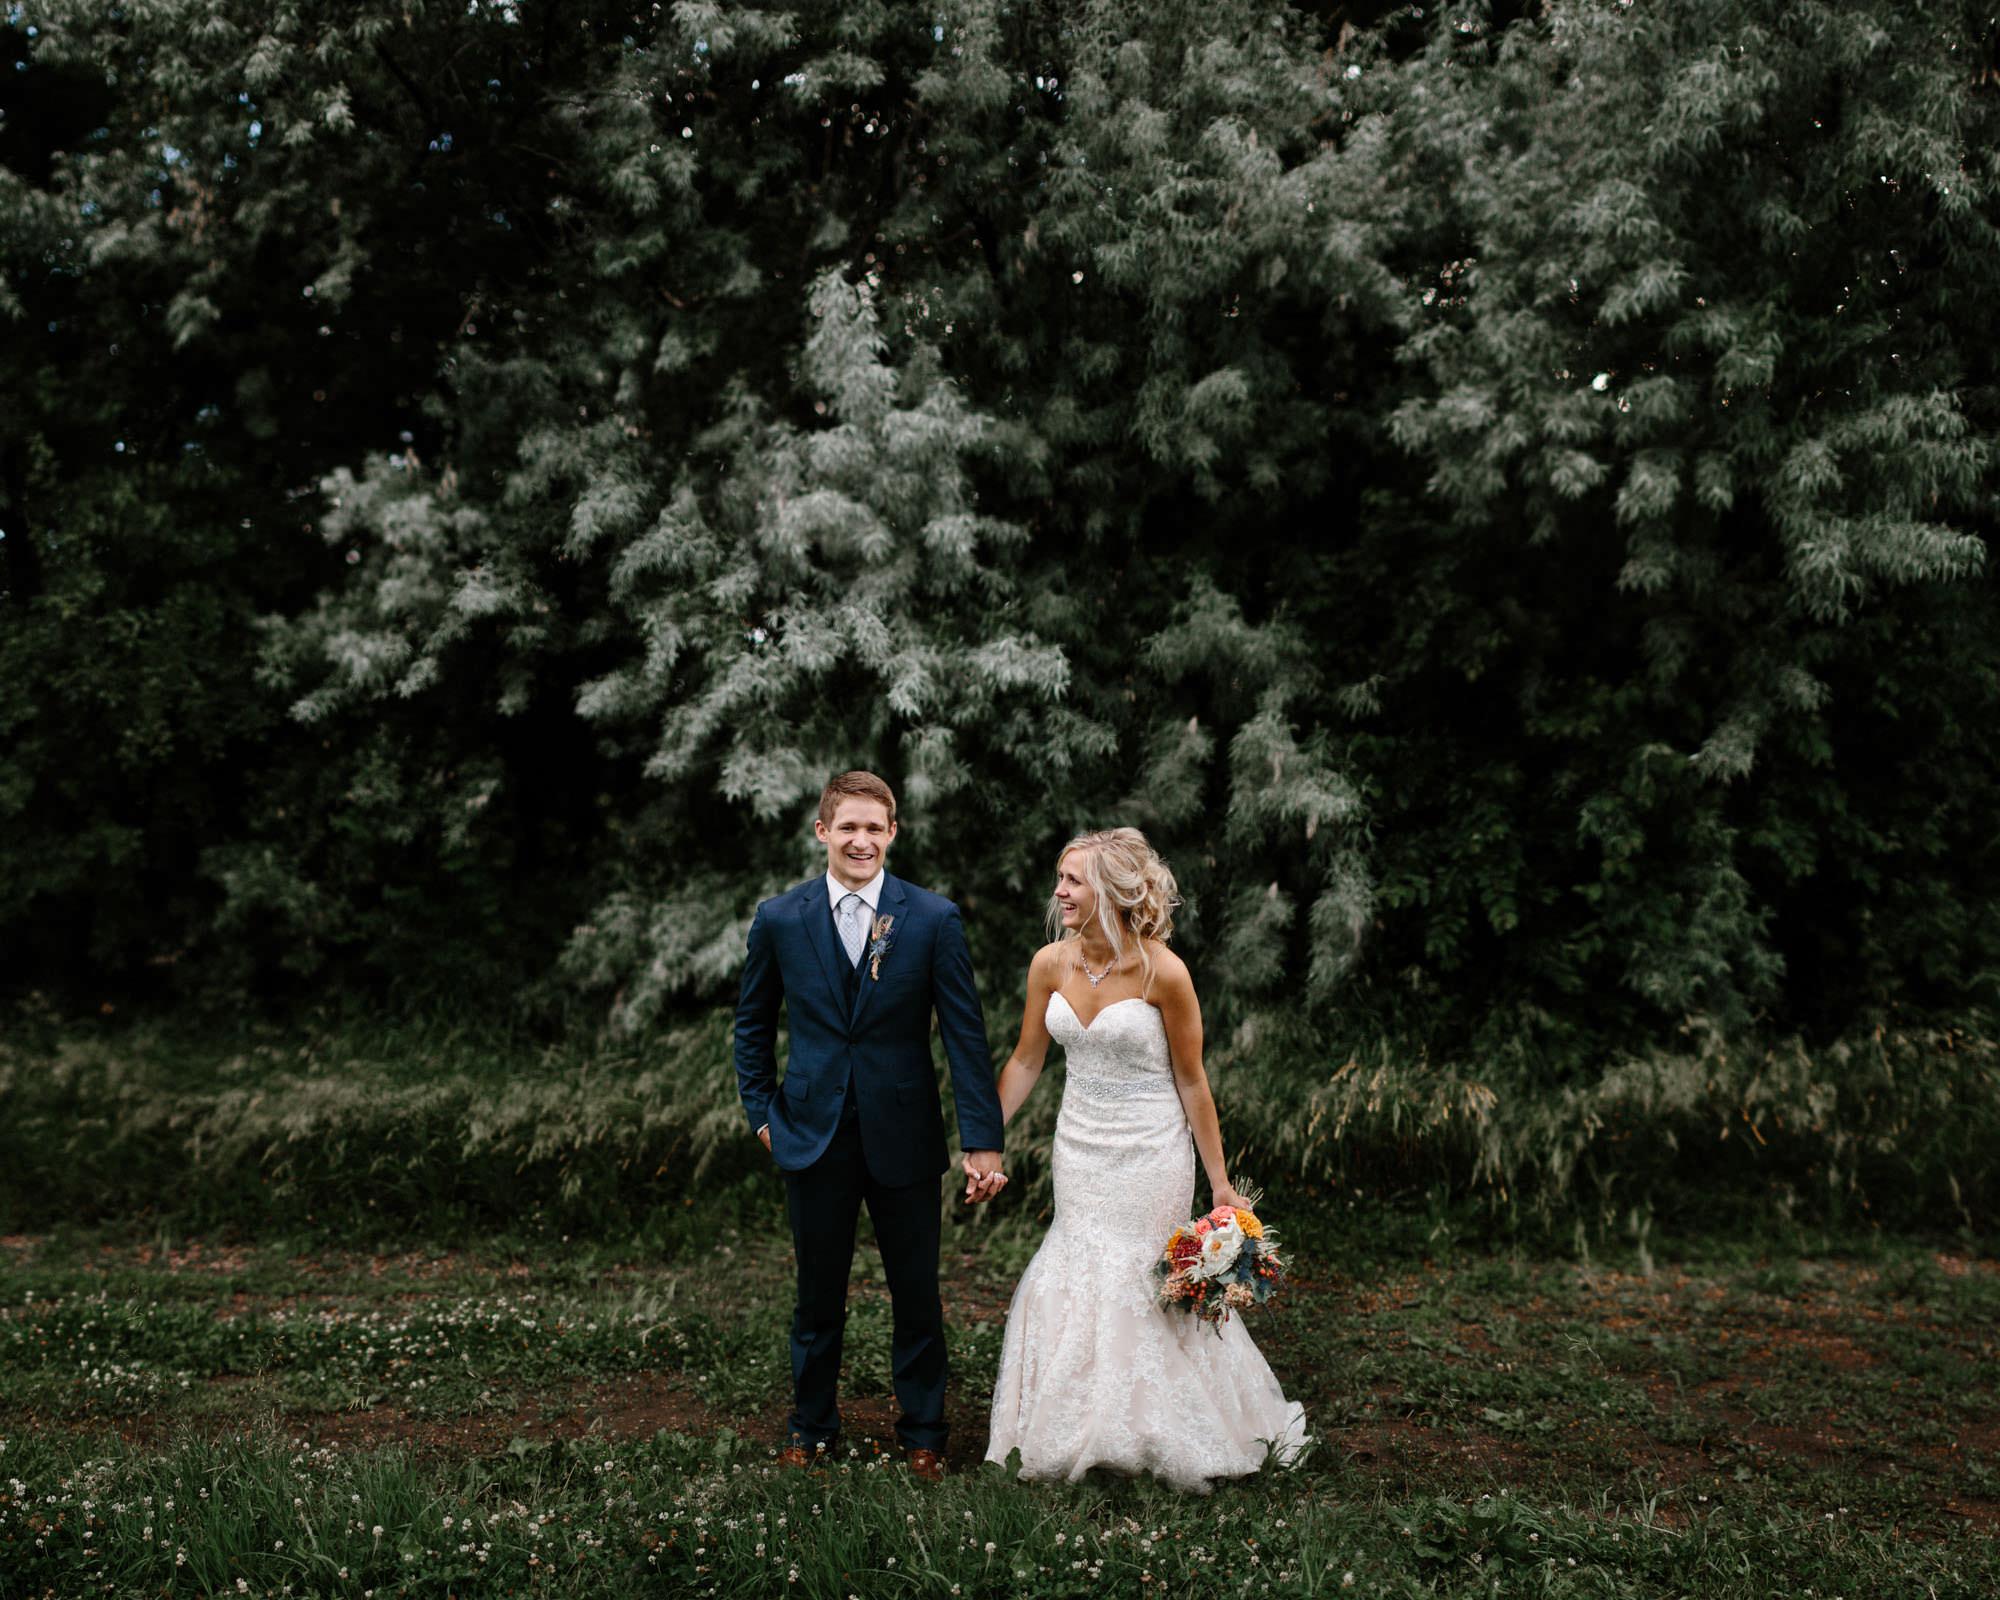 meadow-barn-wedding-sioux-falls-south-dakota-romantic-adventerous-michael-liedtke-photography090.jpg